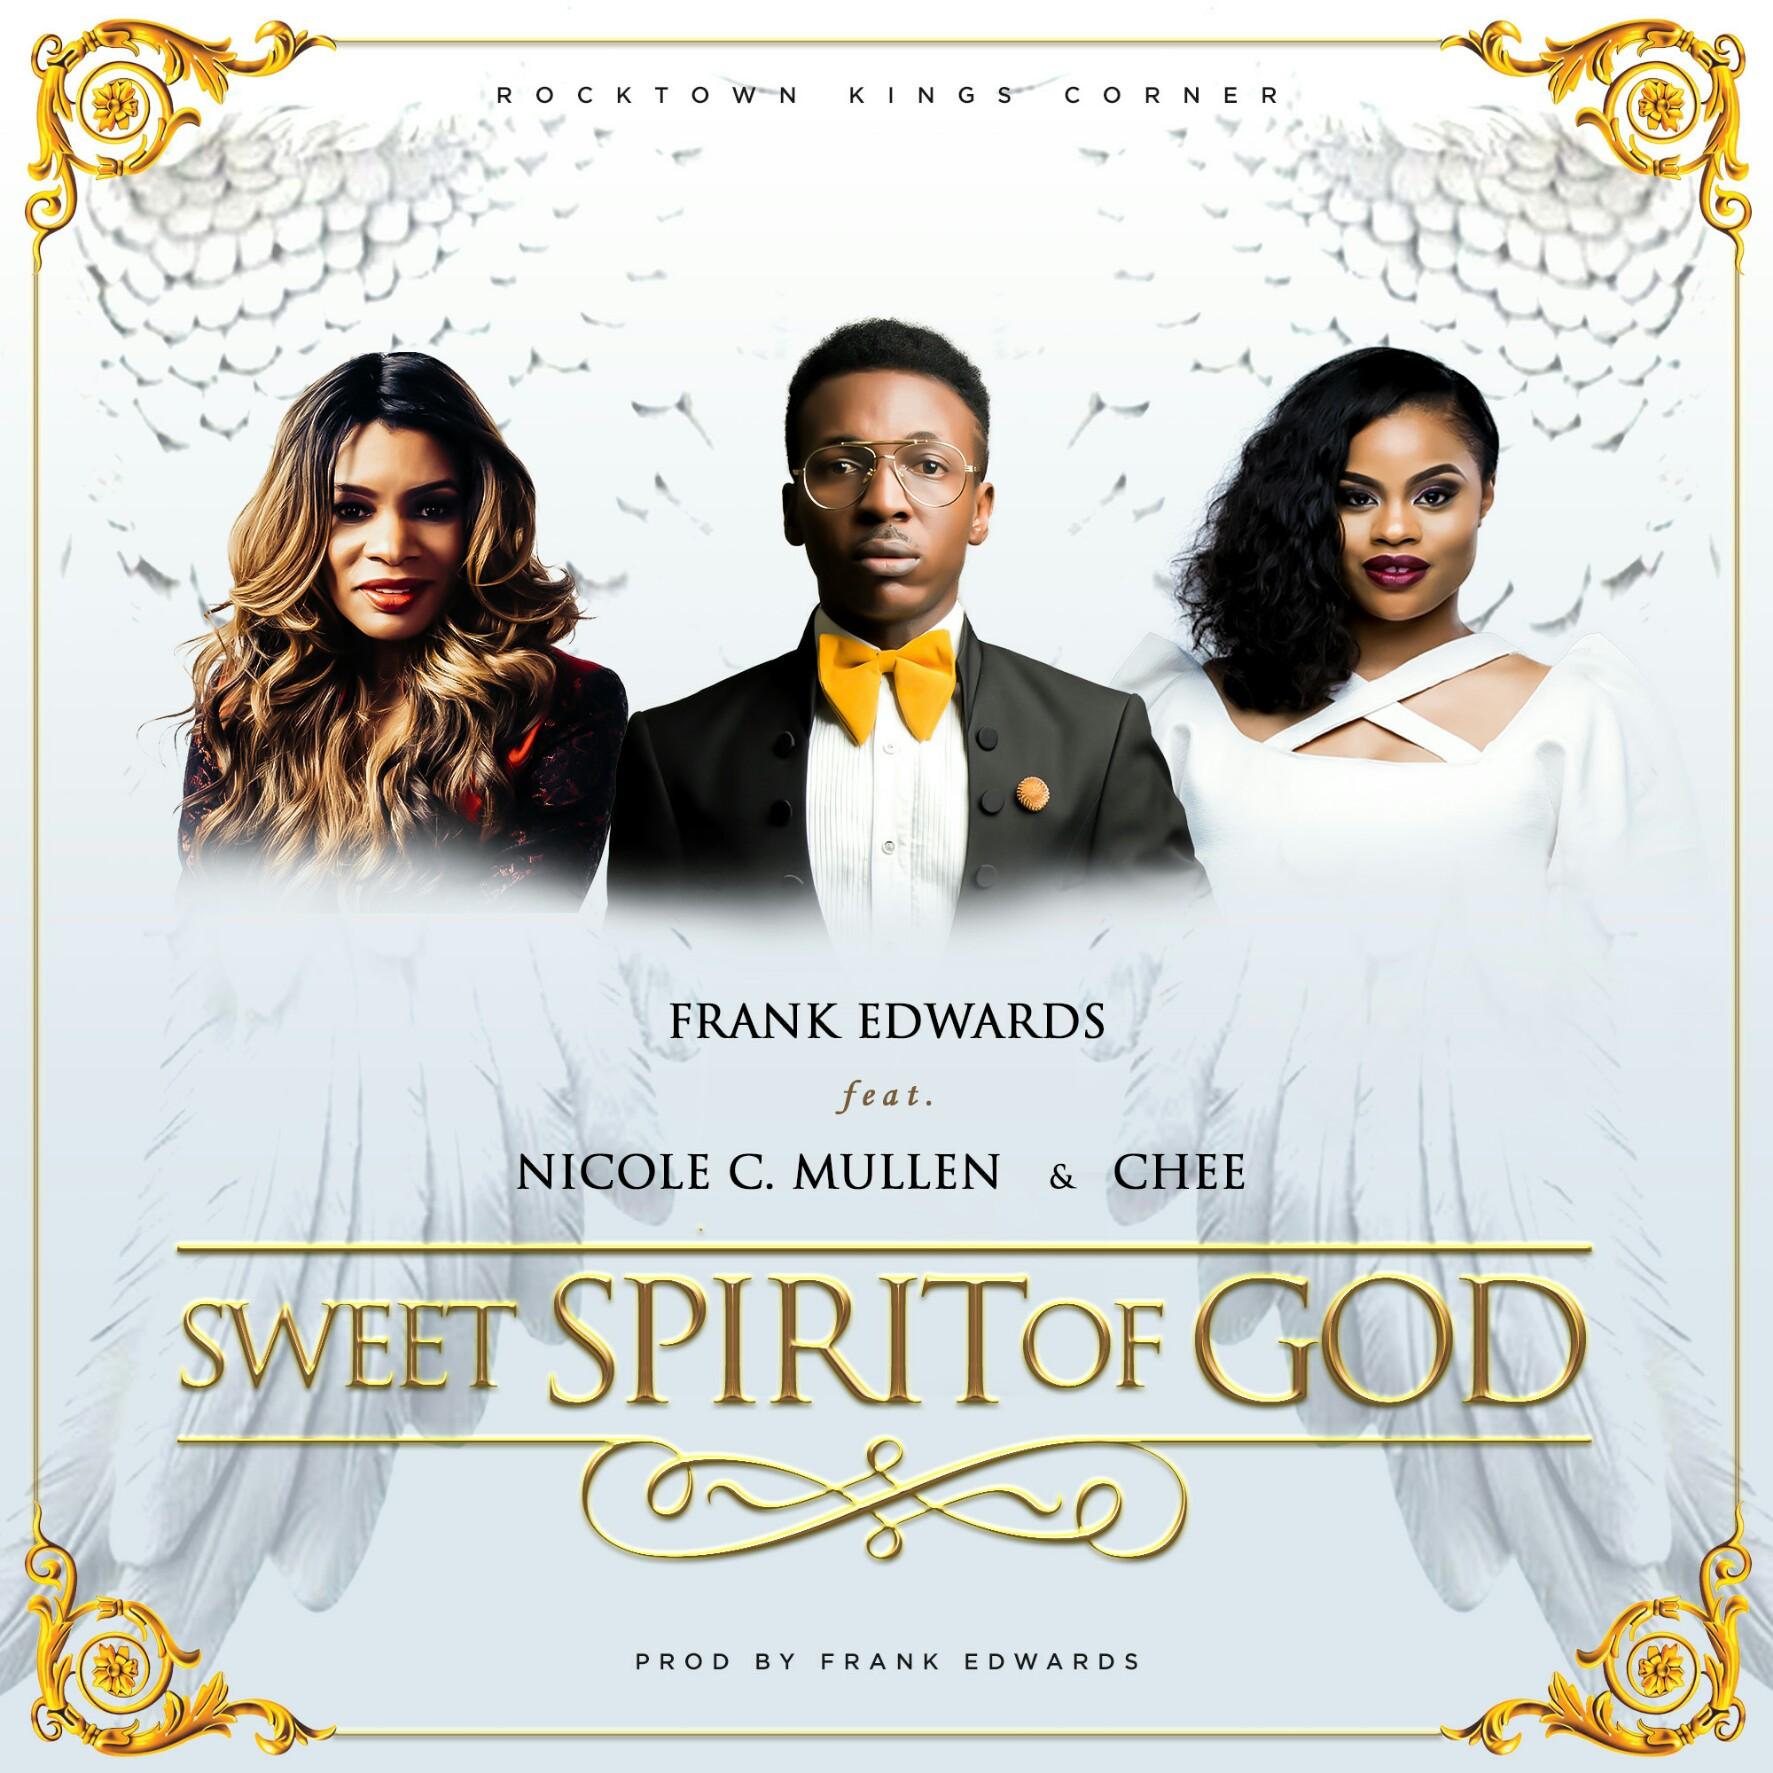 Frank Edwards – Sweet Spirit Of God (ft. Nicole C. Mullen & Chee)